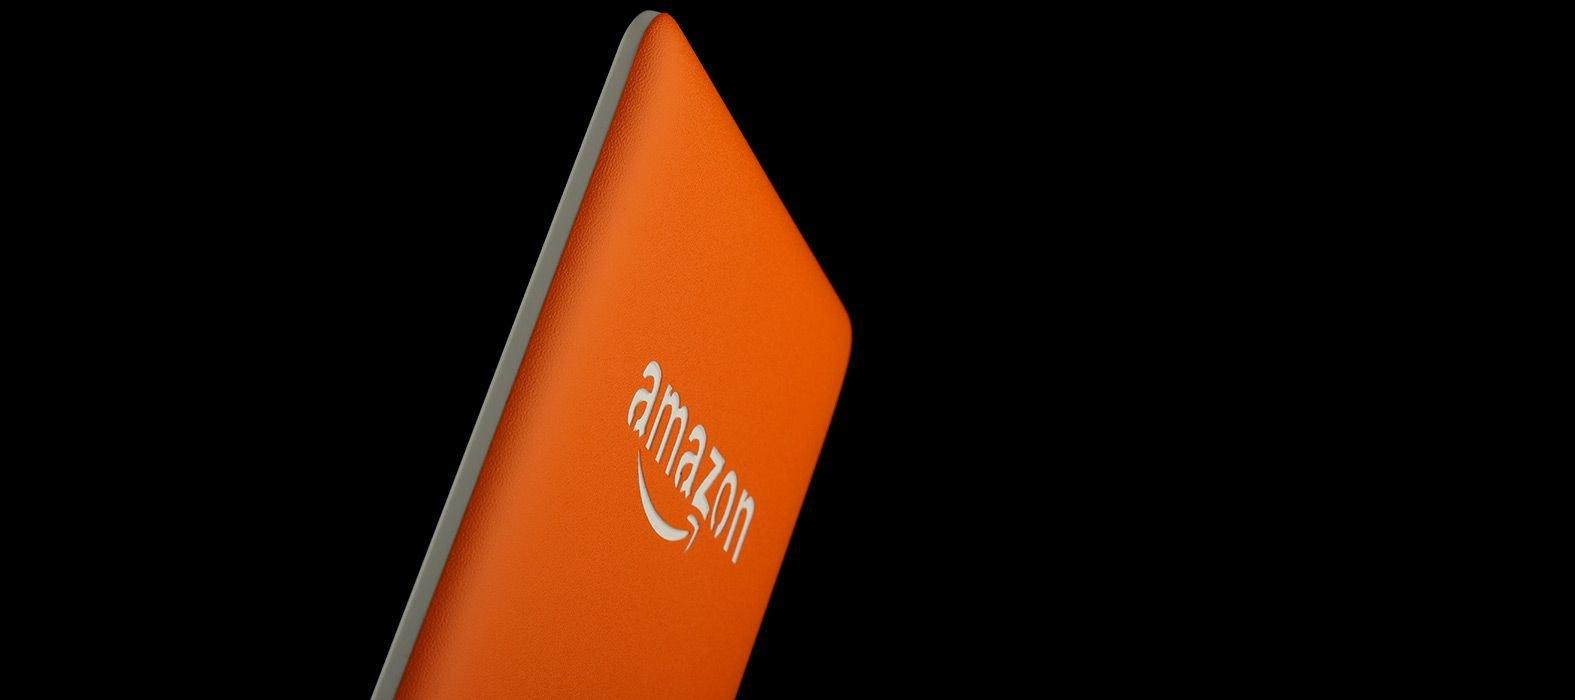 Amazon-Kindle-Paperwhite-(7th-Gen)-6-Inch-Sandstone-Orange-Skins